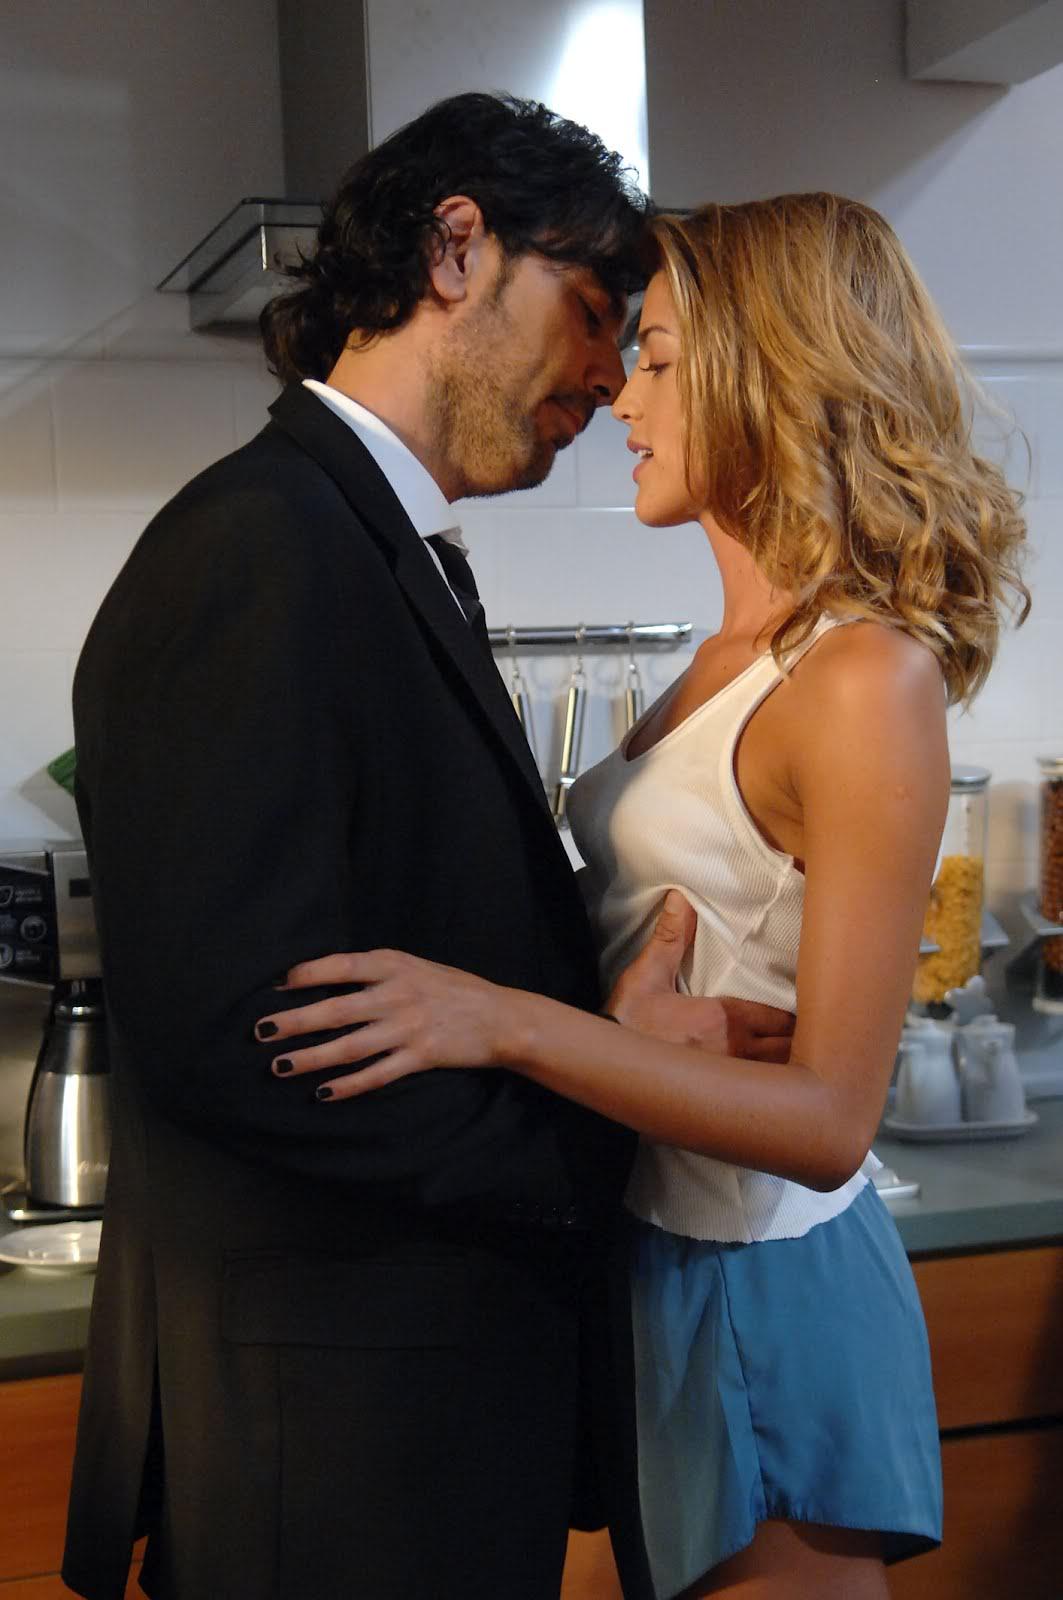 Аргентинские теленовеллы 2012 - Página 12 DSC_2717